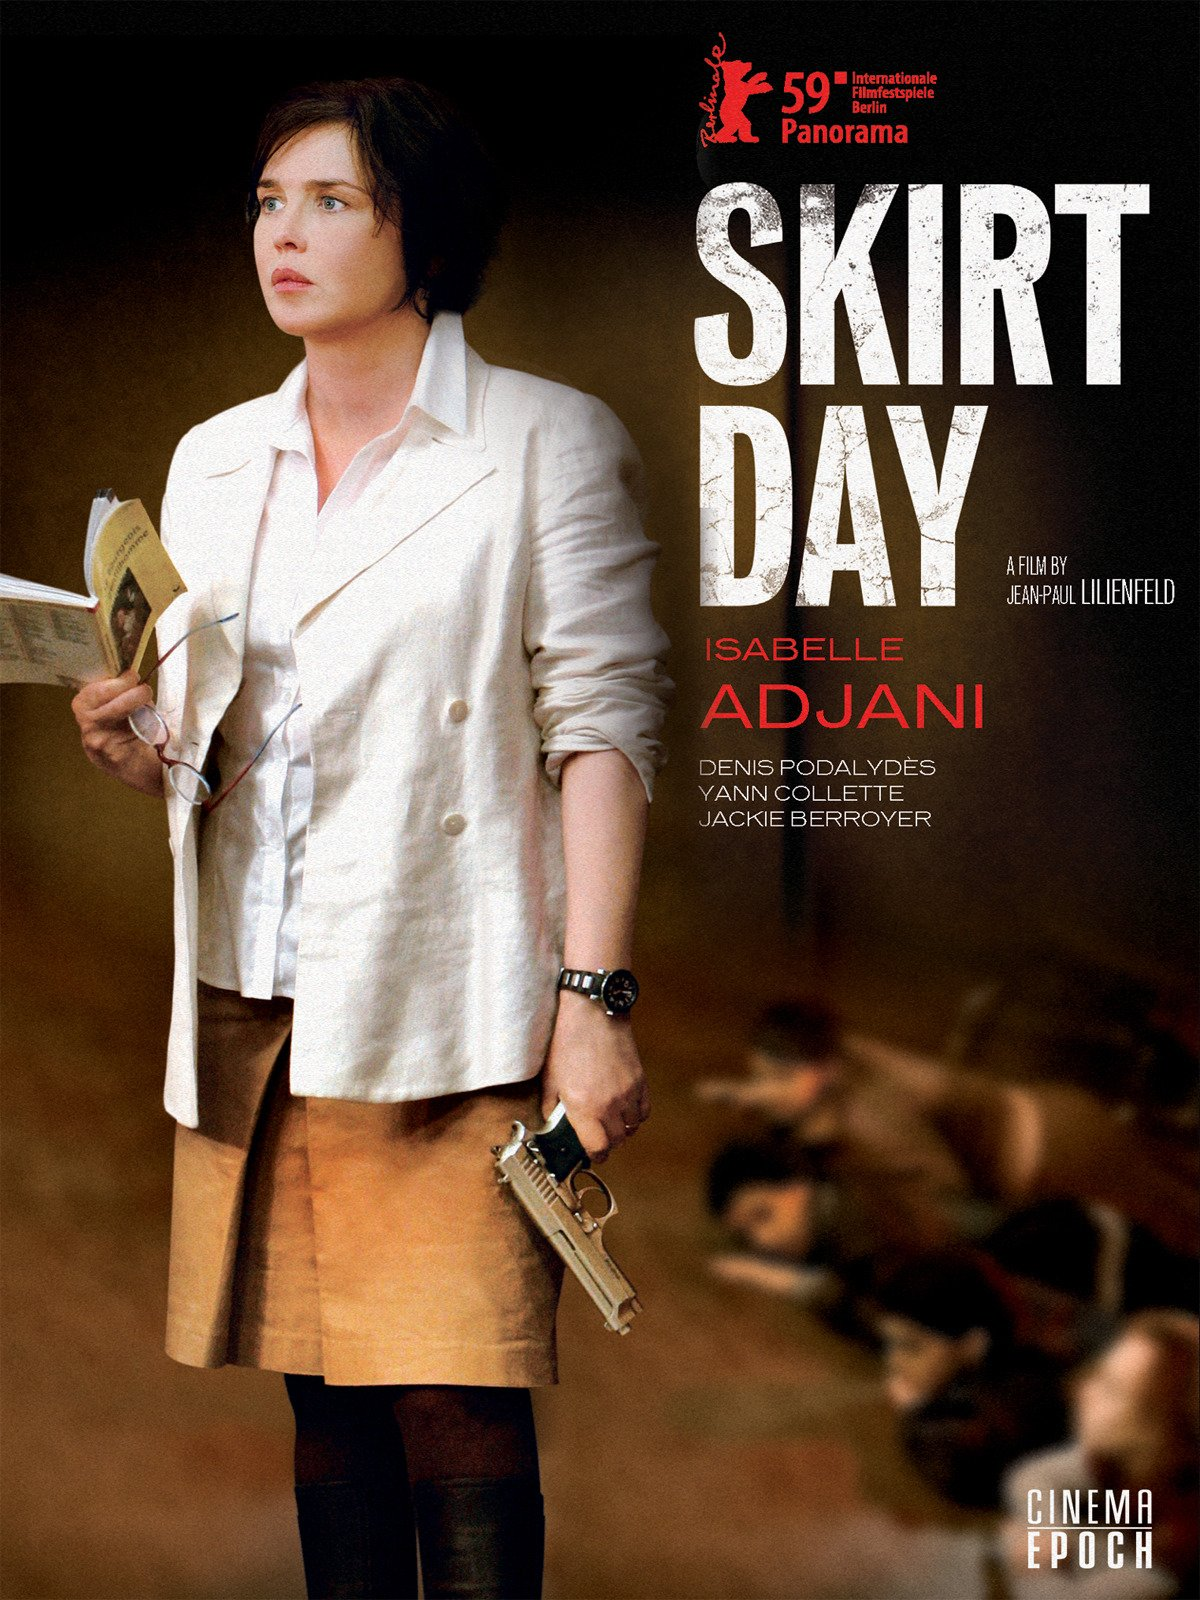 Amazon.com: Skirt Day: Isabelle Adjani, Denis Podalydes, Yann Collette,  Jackie Berroyer: Amazon Digital Services LLC